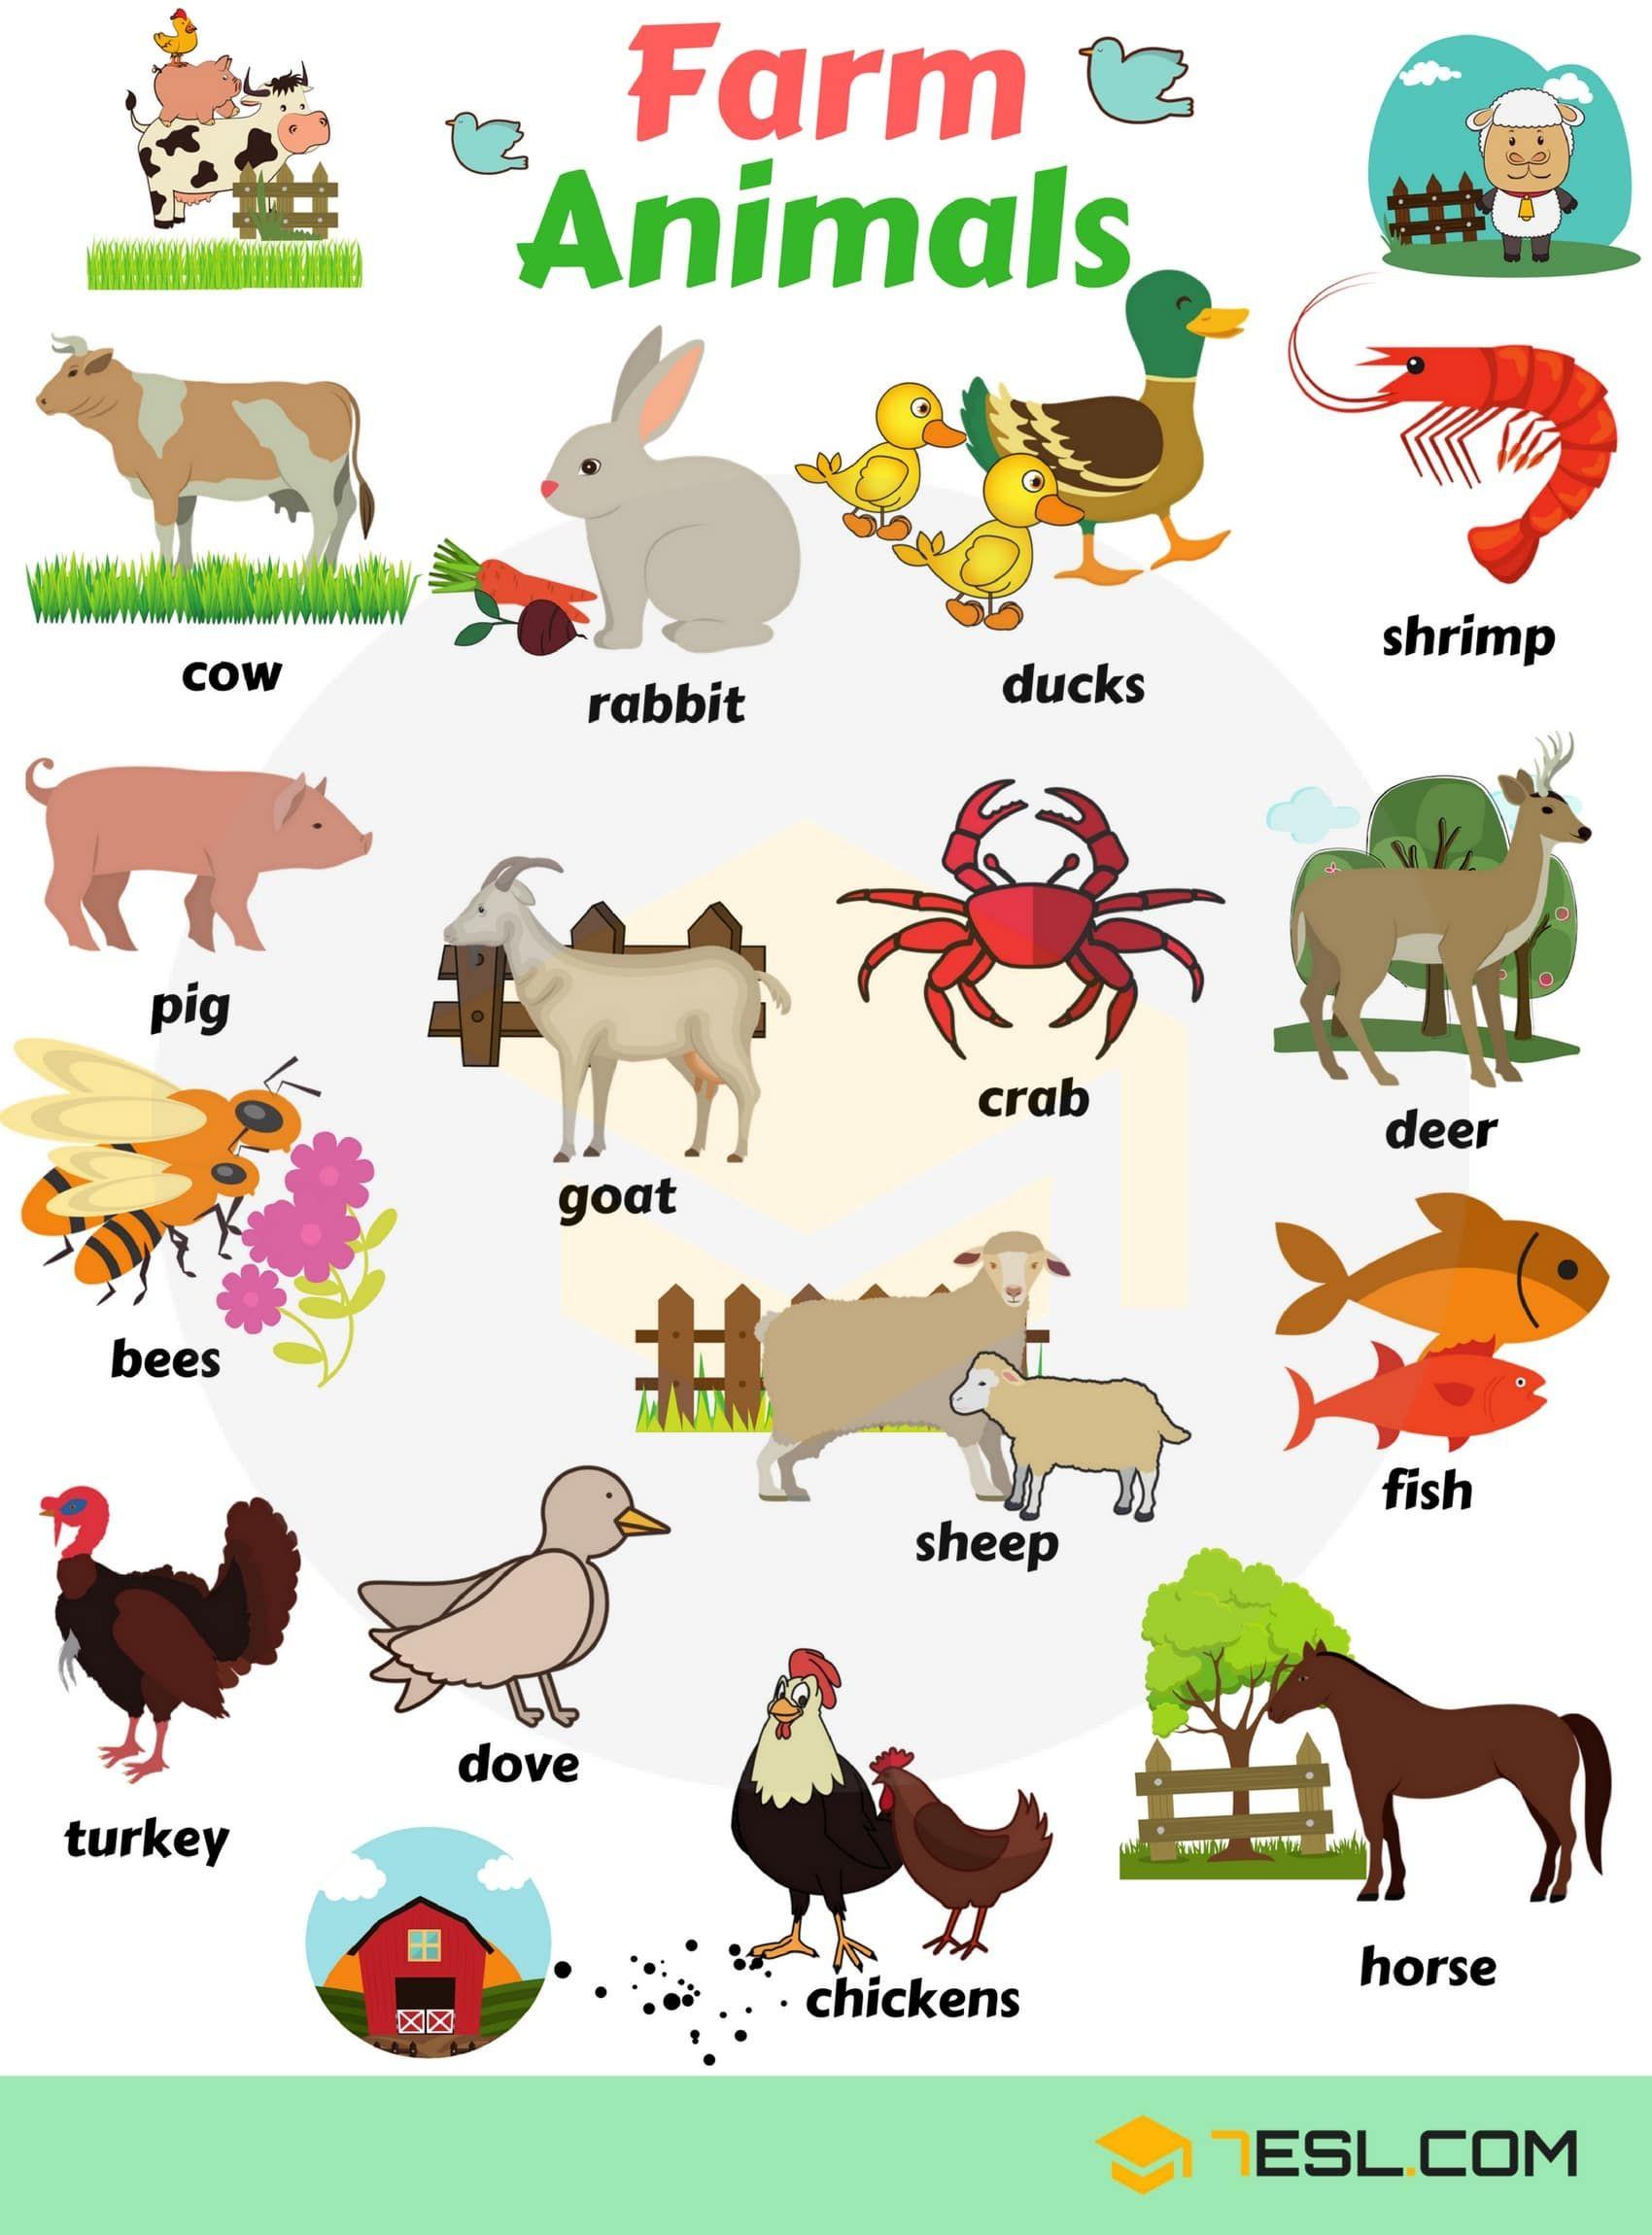 6 Farm Animals Primary School